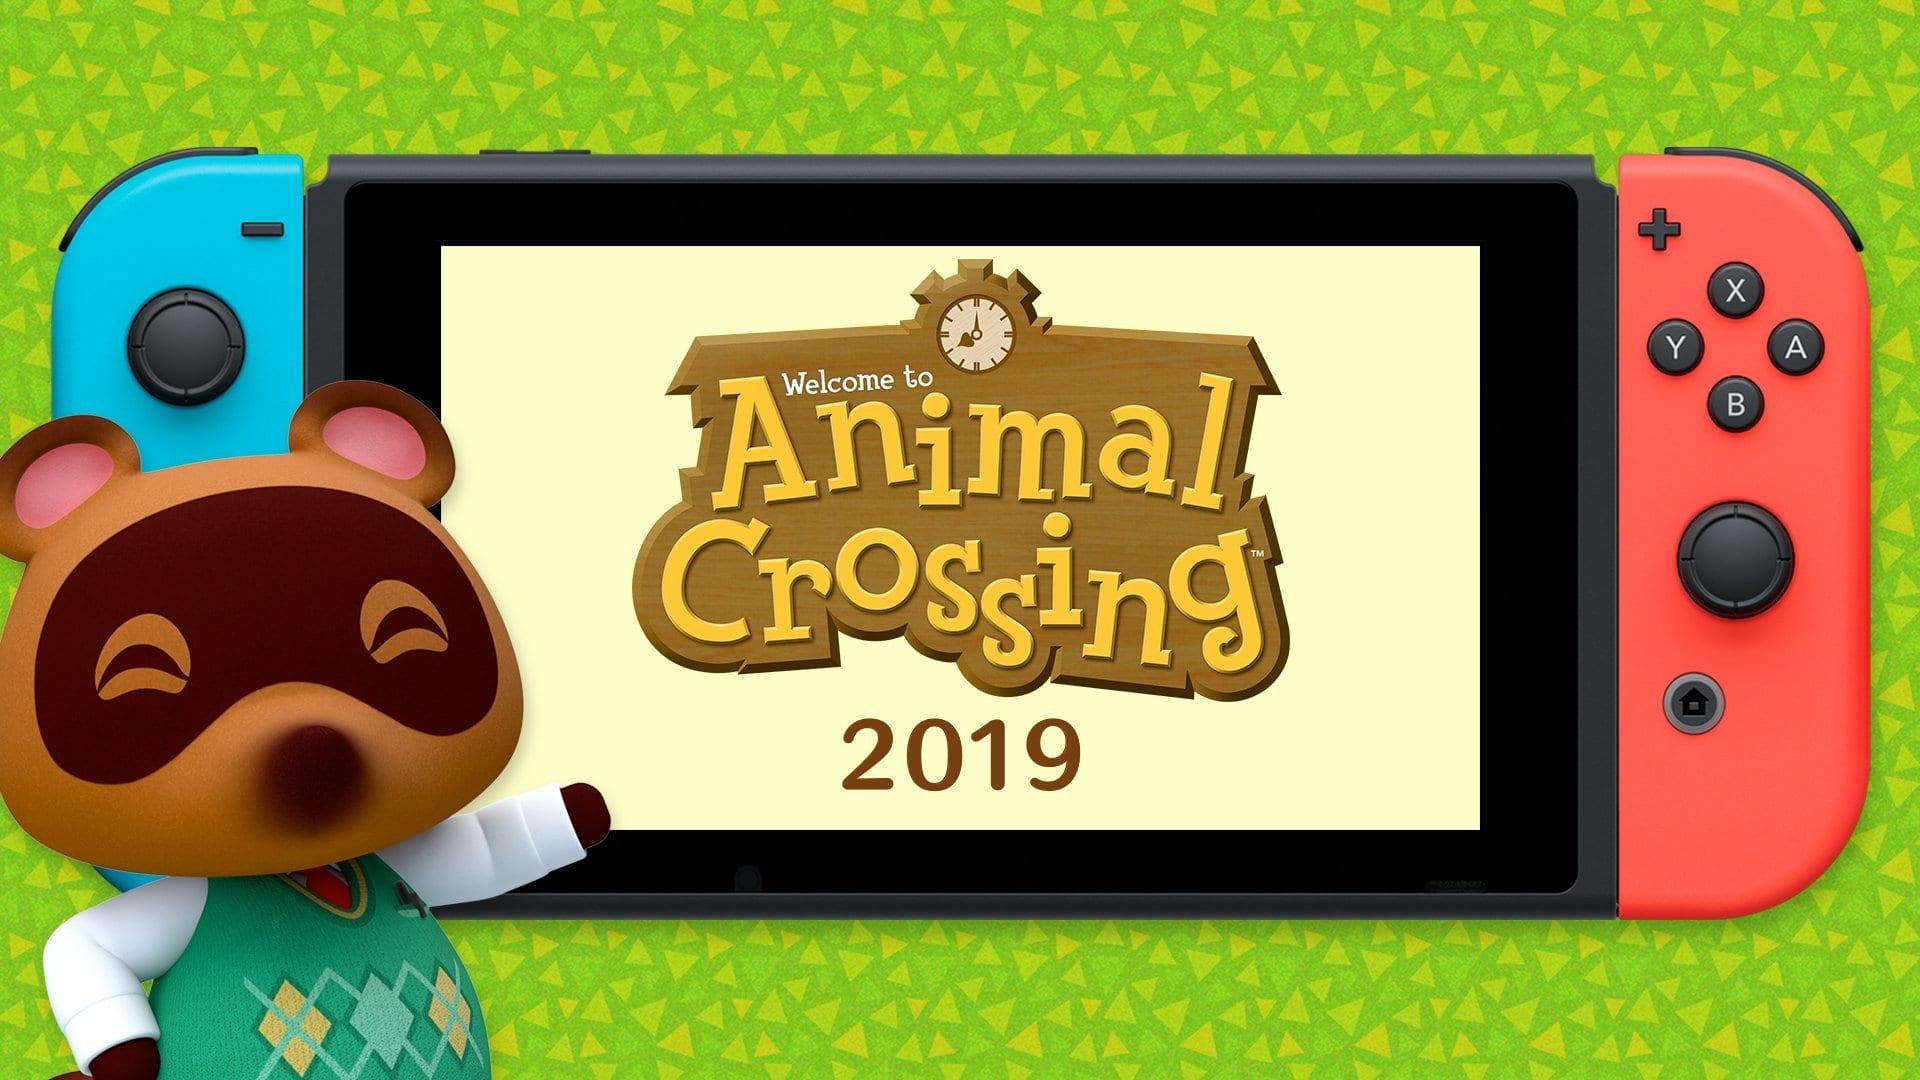 Animal Crossing Nintendo switch update